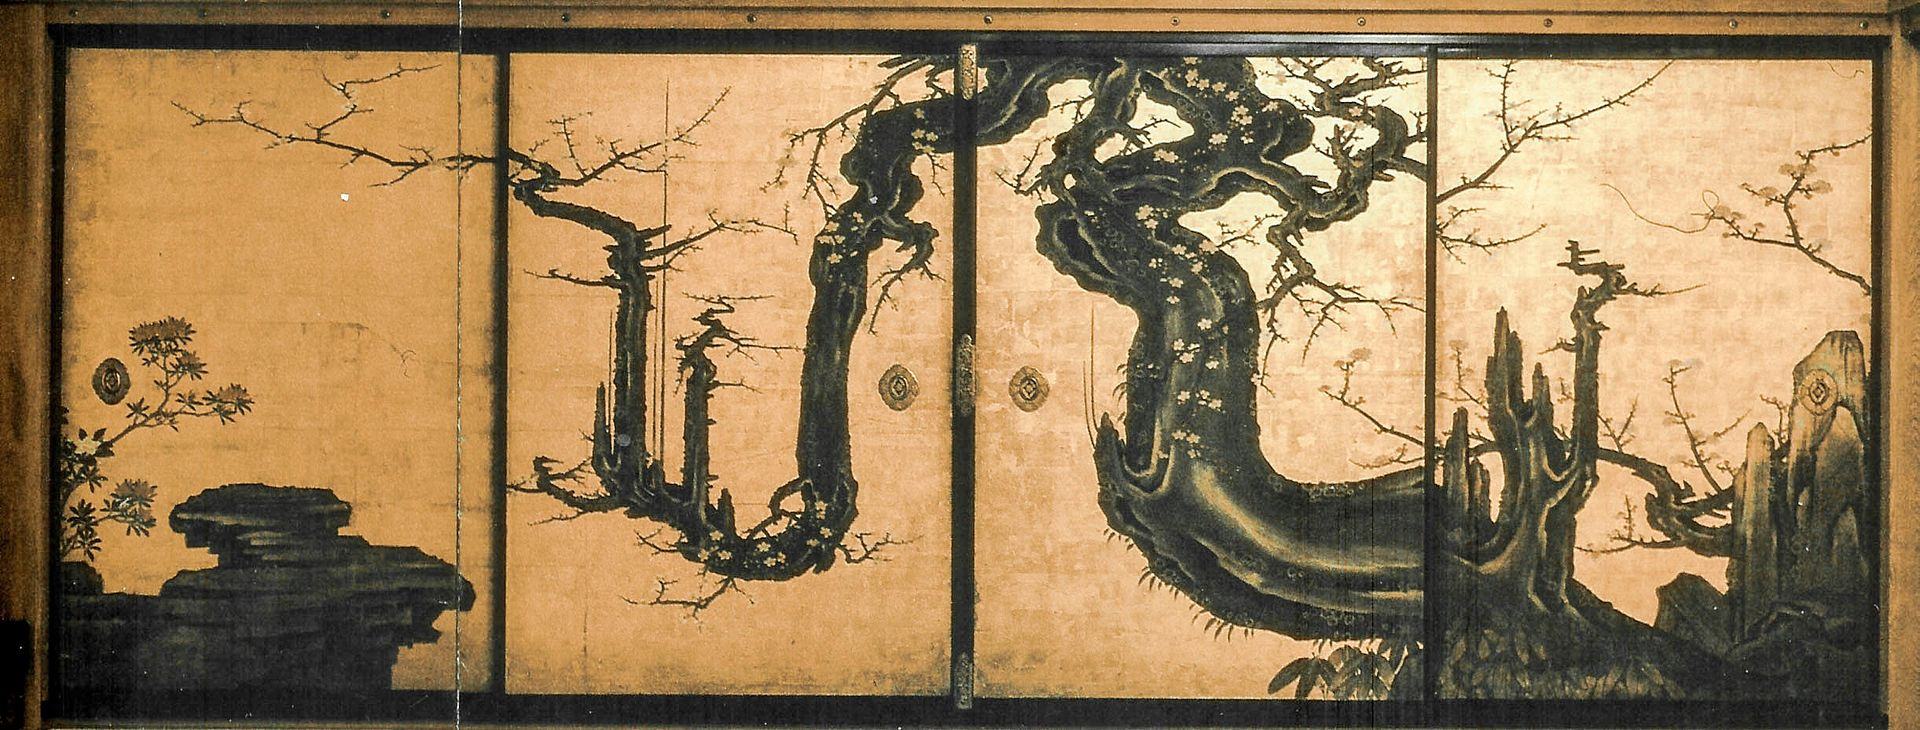 Kanō Sansetsu Wikipedia